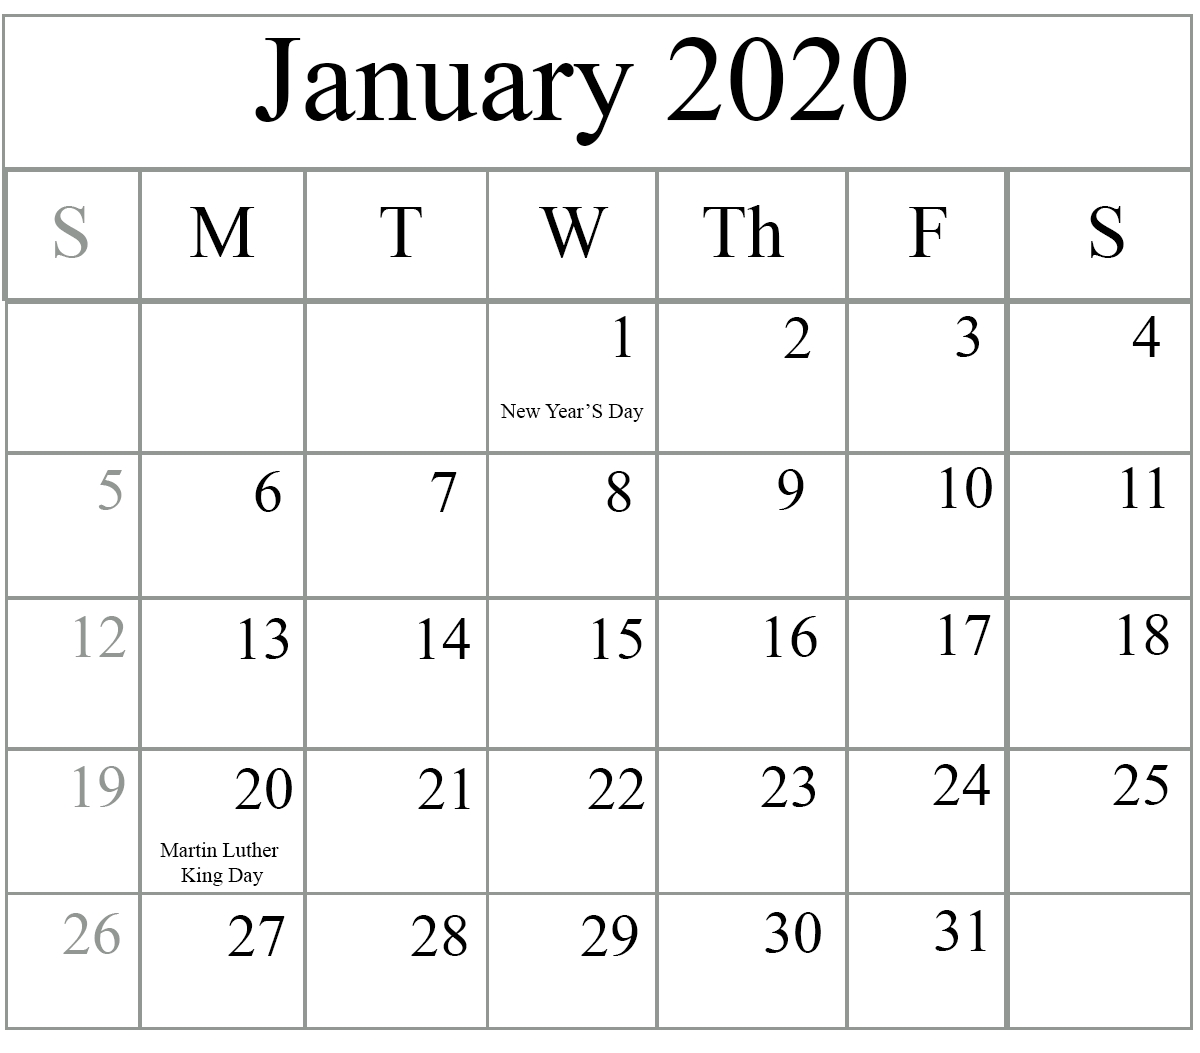 Free 2020 Calendar Template Word - Colona.rsd7 Microsoft Word Printable Calendar 2020